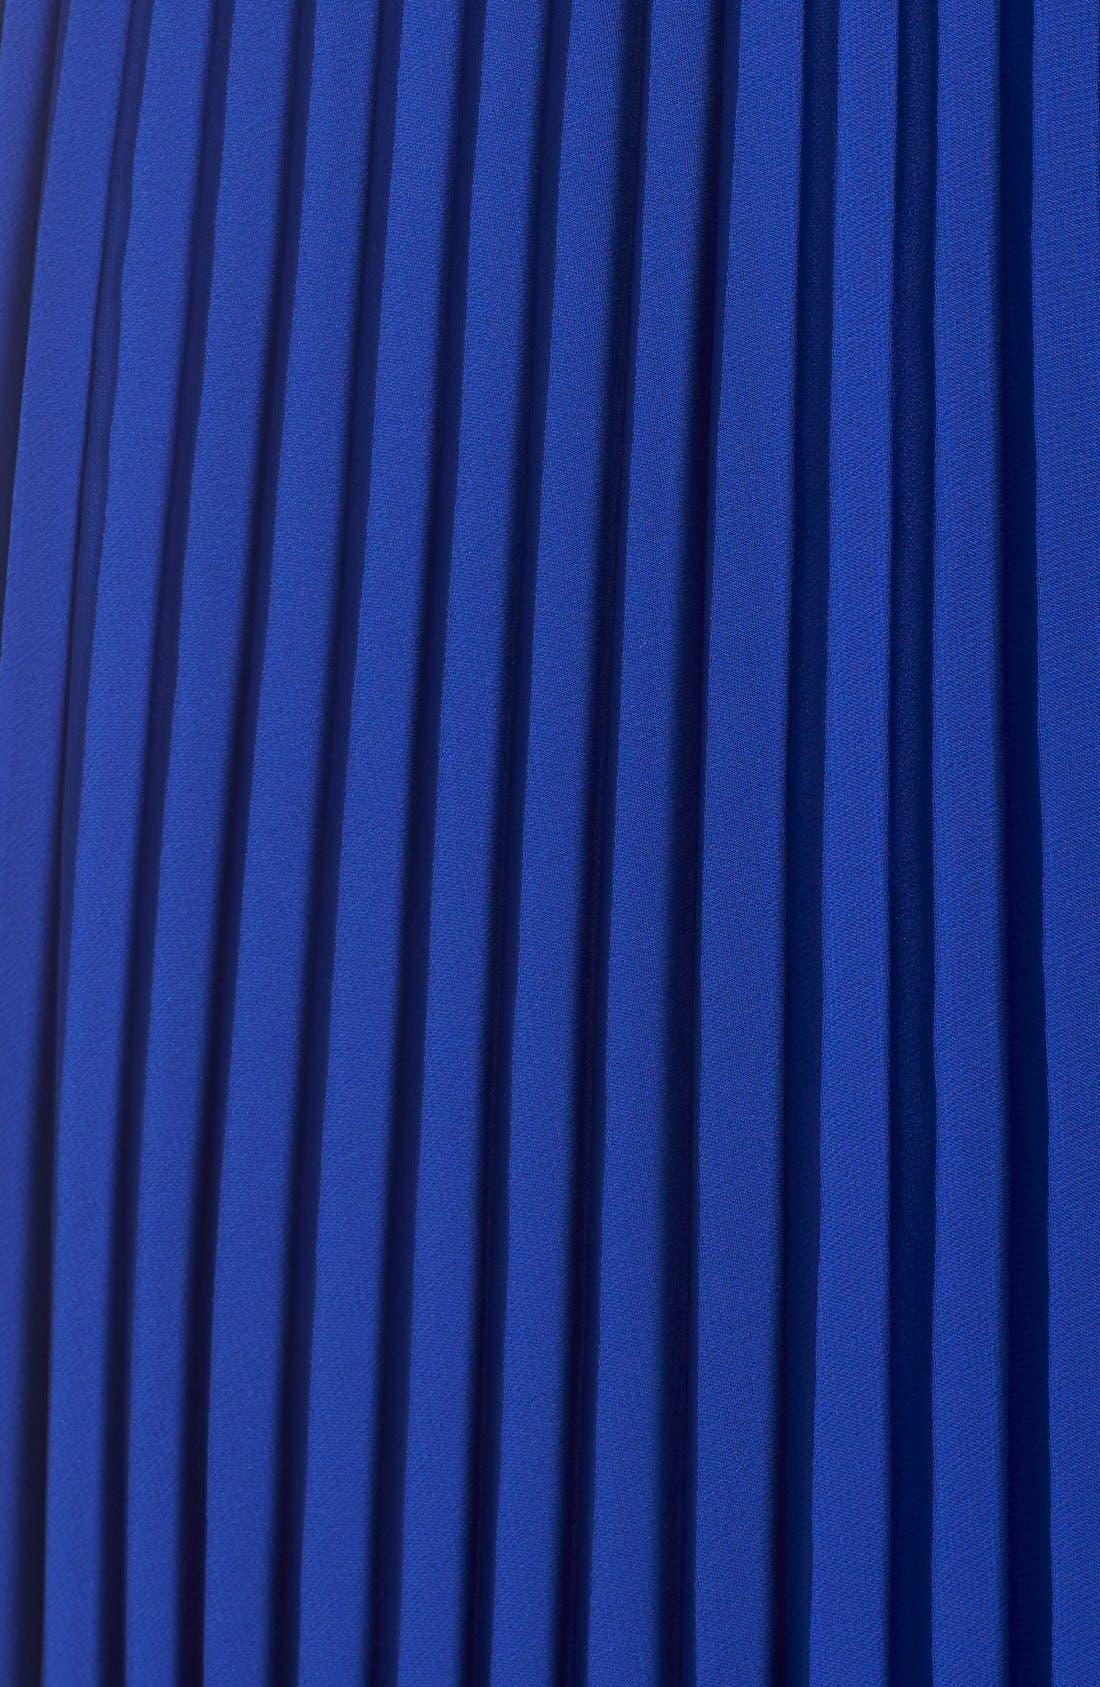 Pleated Chiffon Maxi Dress,                             Alternate thumbnail 5, color,                             430